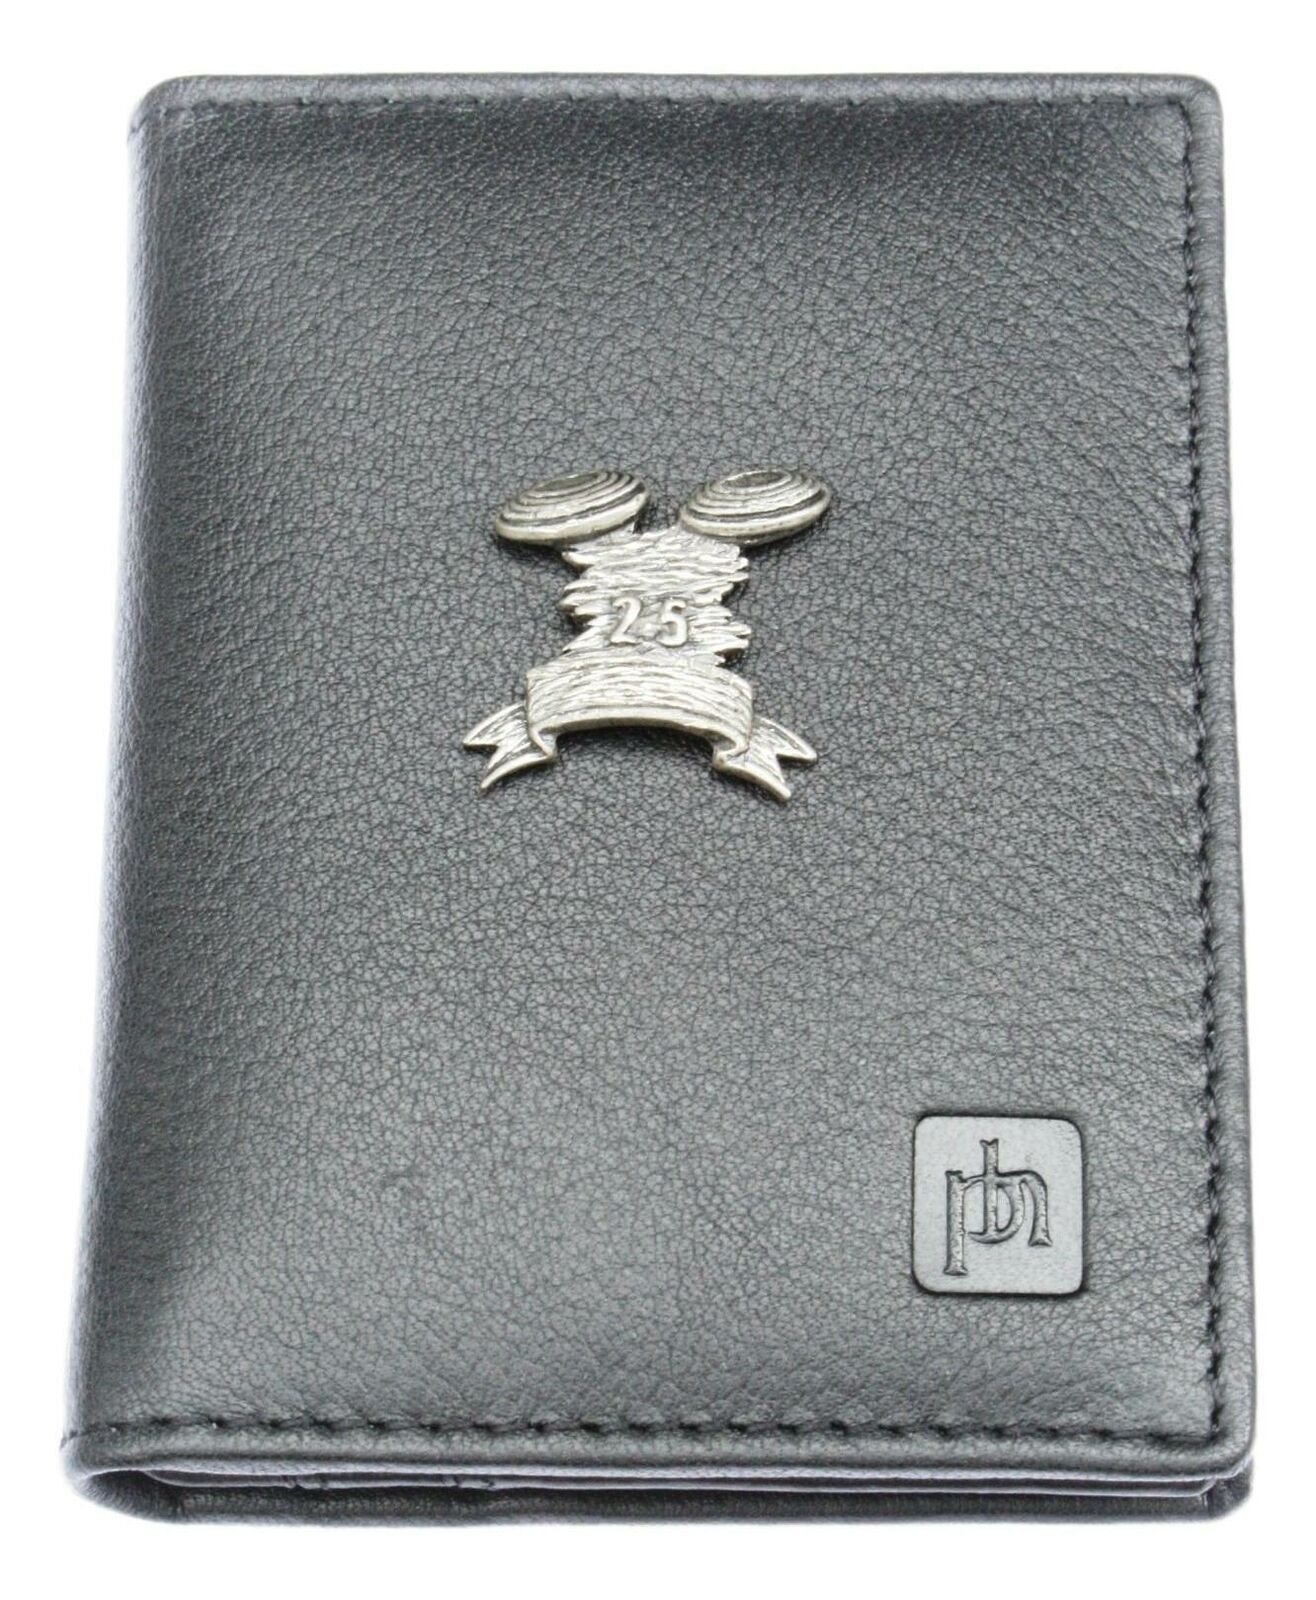 Clays 25 Bifold Card Holder Leather Black Wallet RFID Safe 76